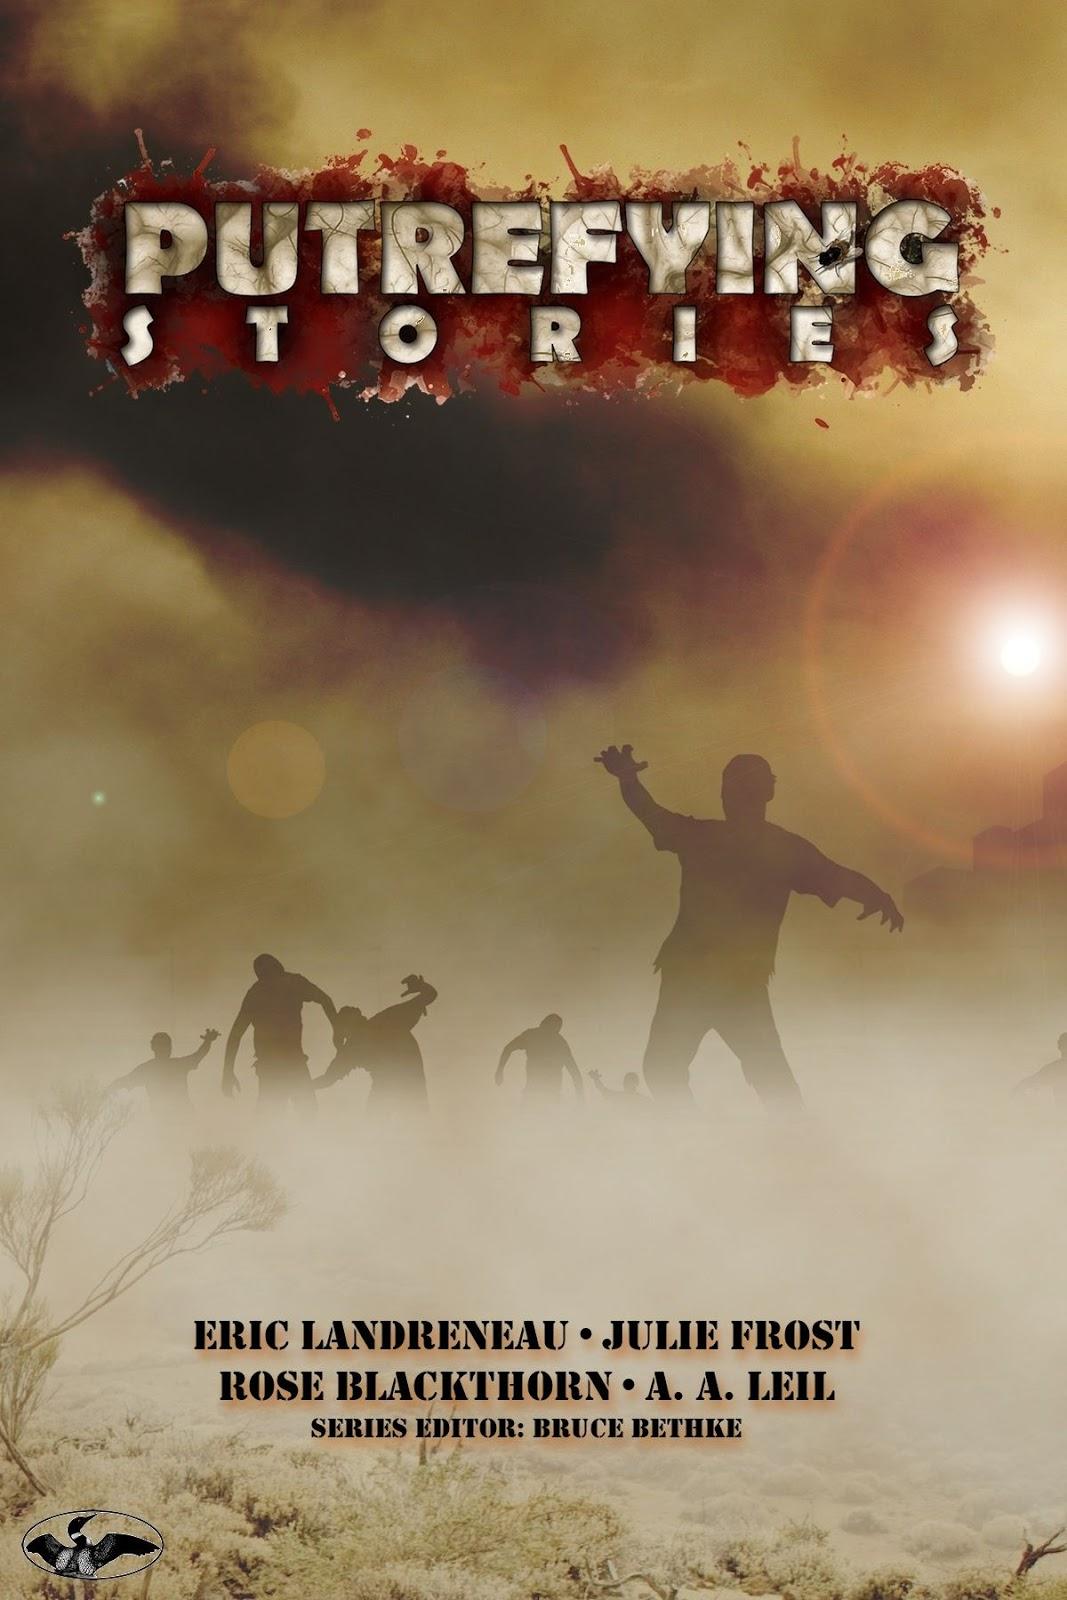 "Book Release: Putrefying Stories #1 """